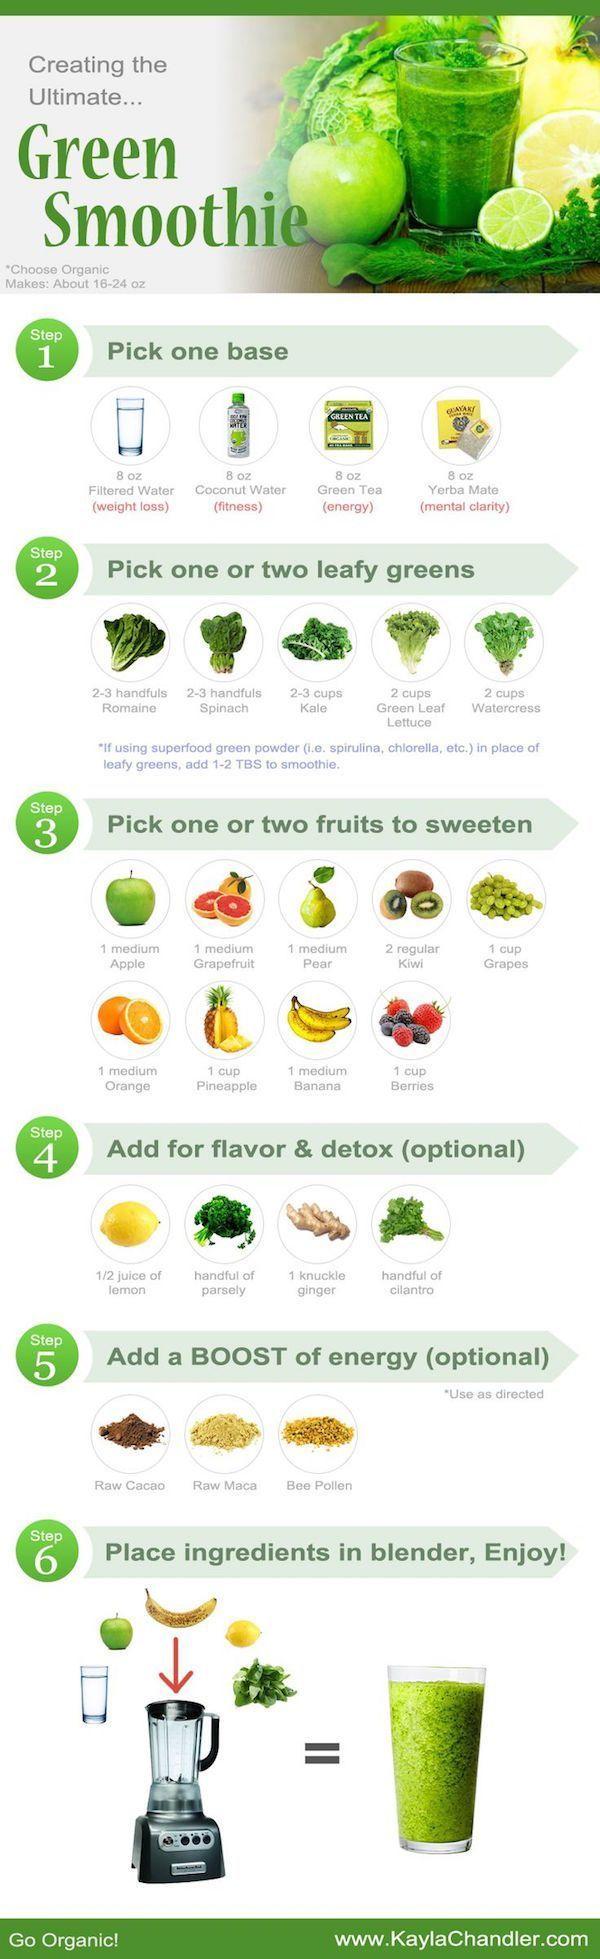 Find the best diet plan for your wedding - fitness -  Find The Best Diet Plan For Your Wedding, Find...